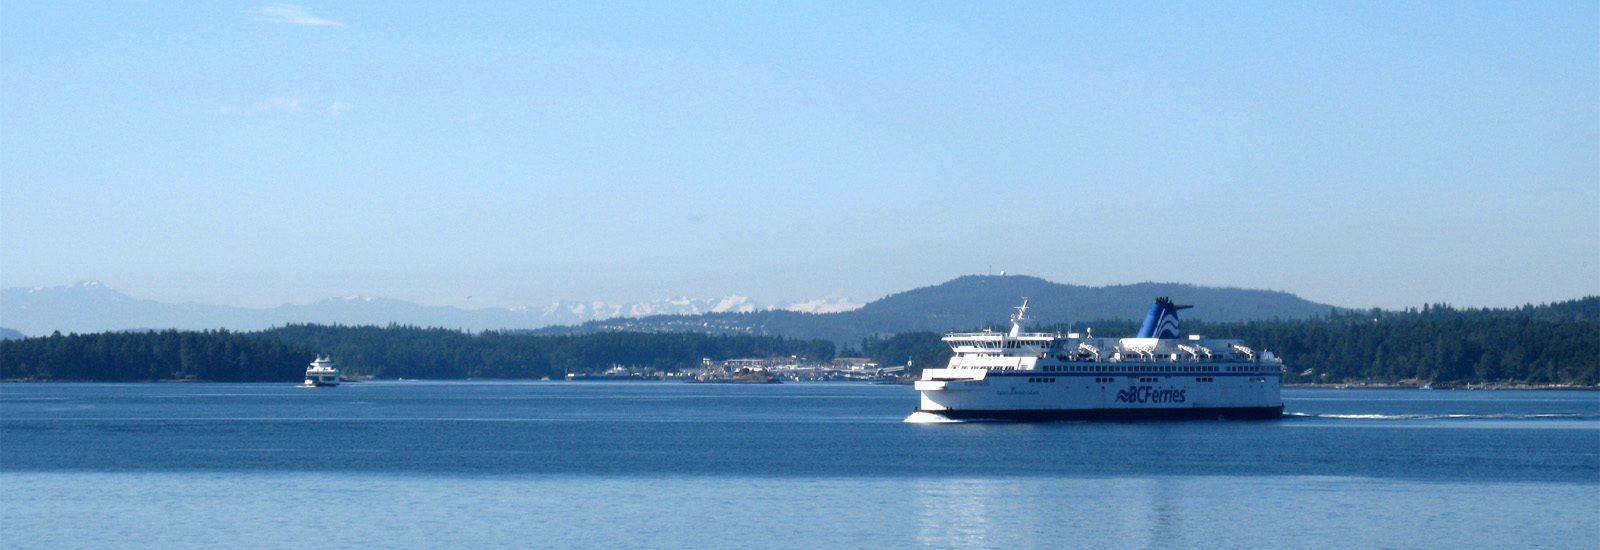 BC Ferries Between Tsawwassen and Swartz Bay-sliver